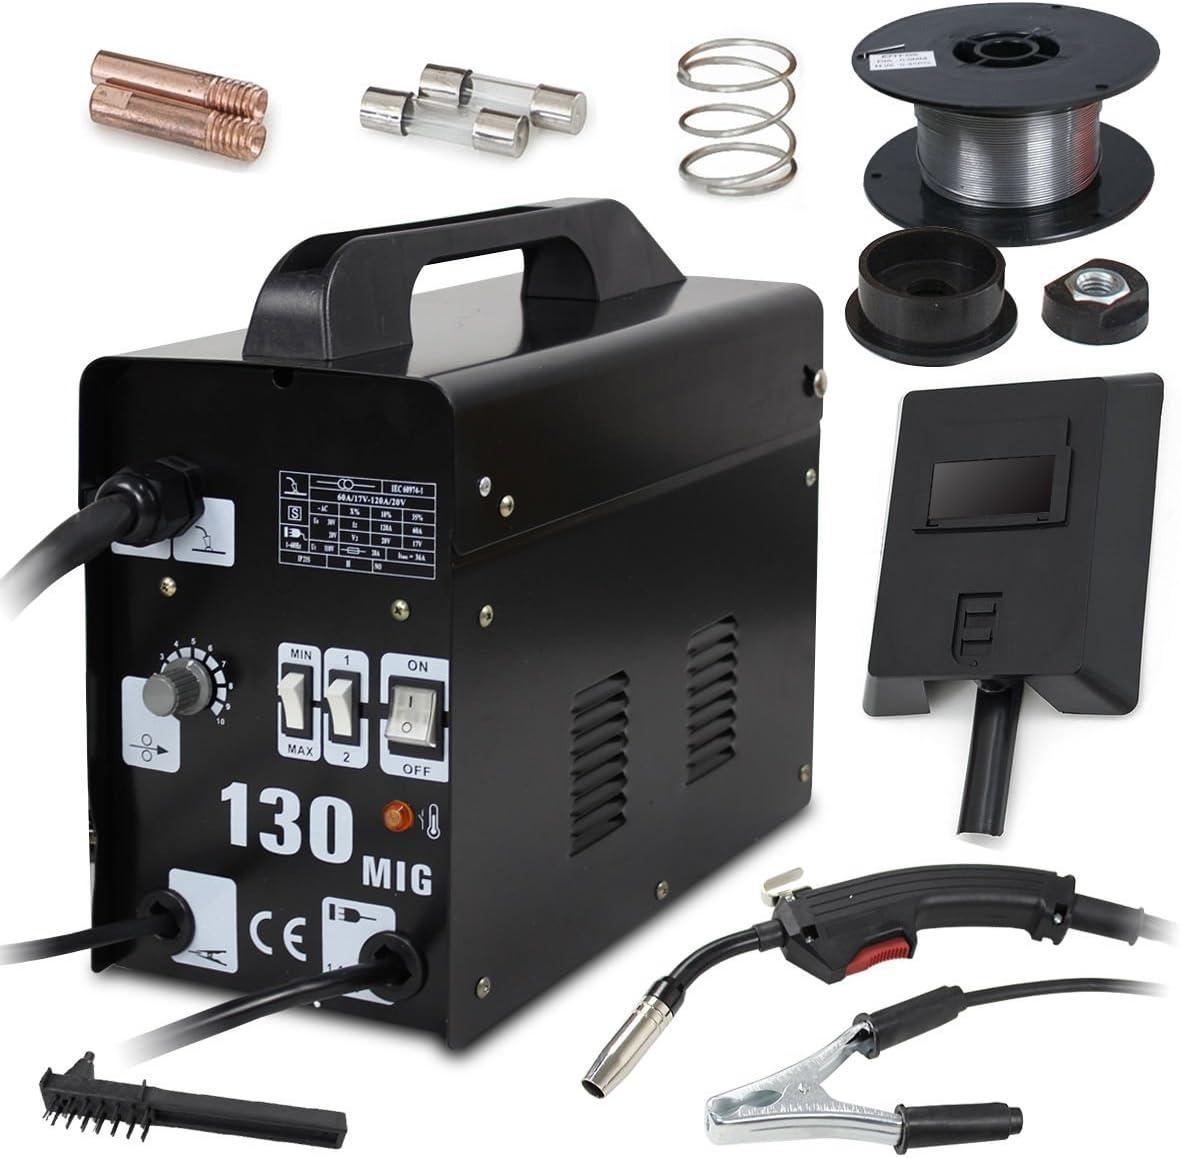 Best for Automatic Feed Welder - Super Deal PRO Welding Machine